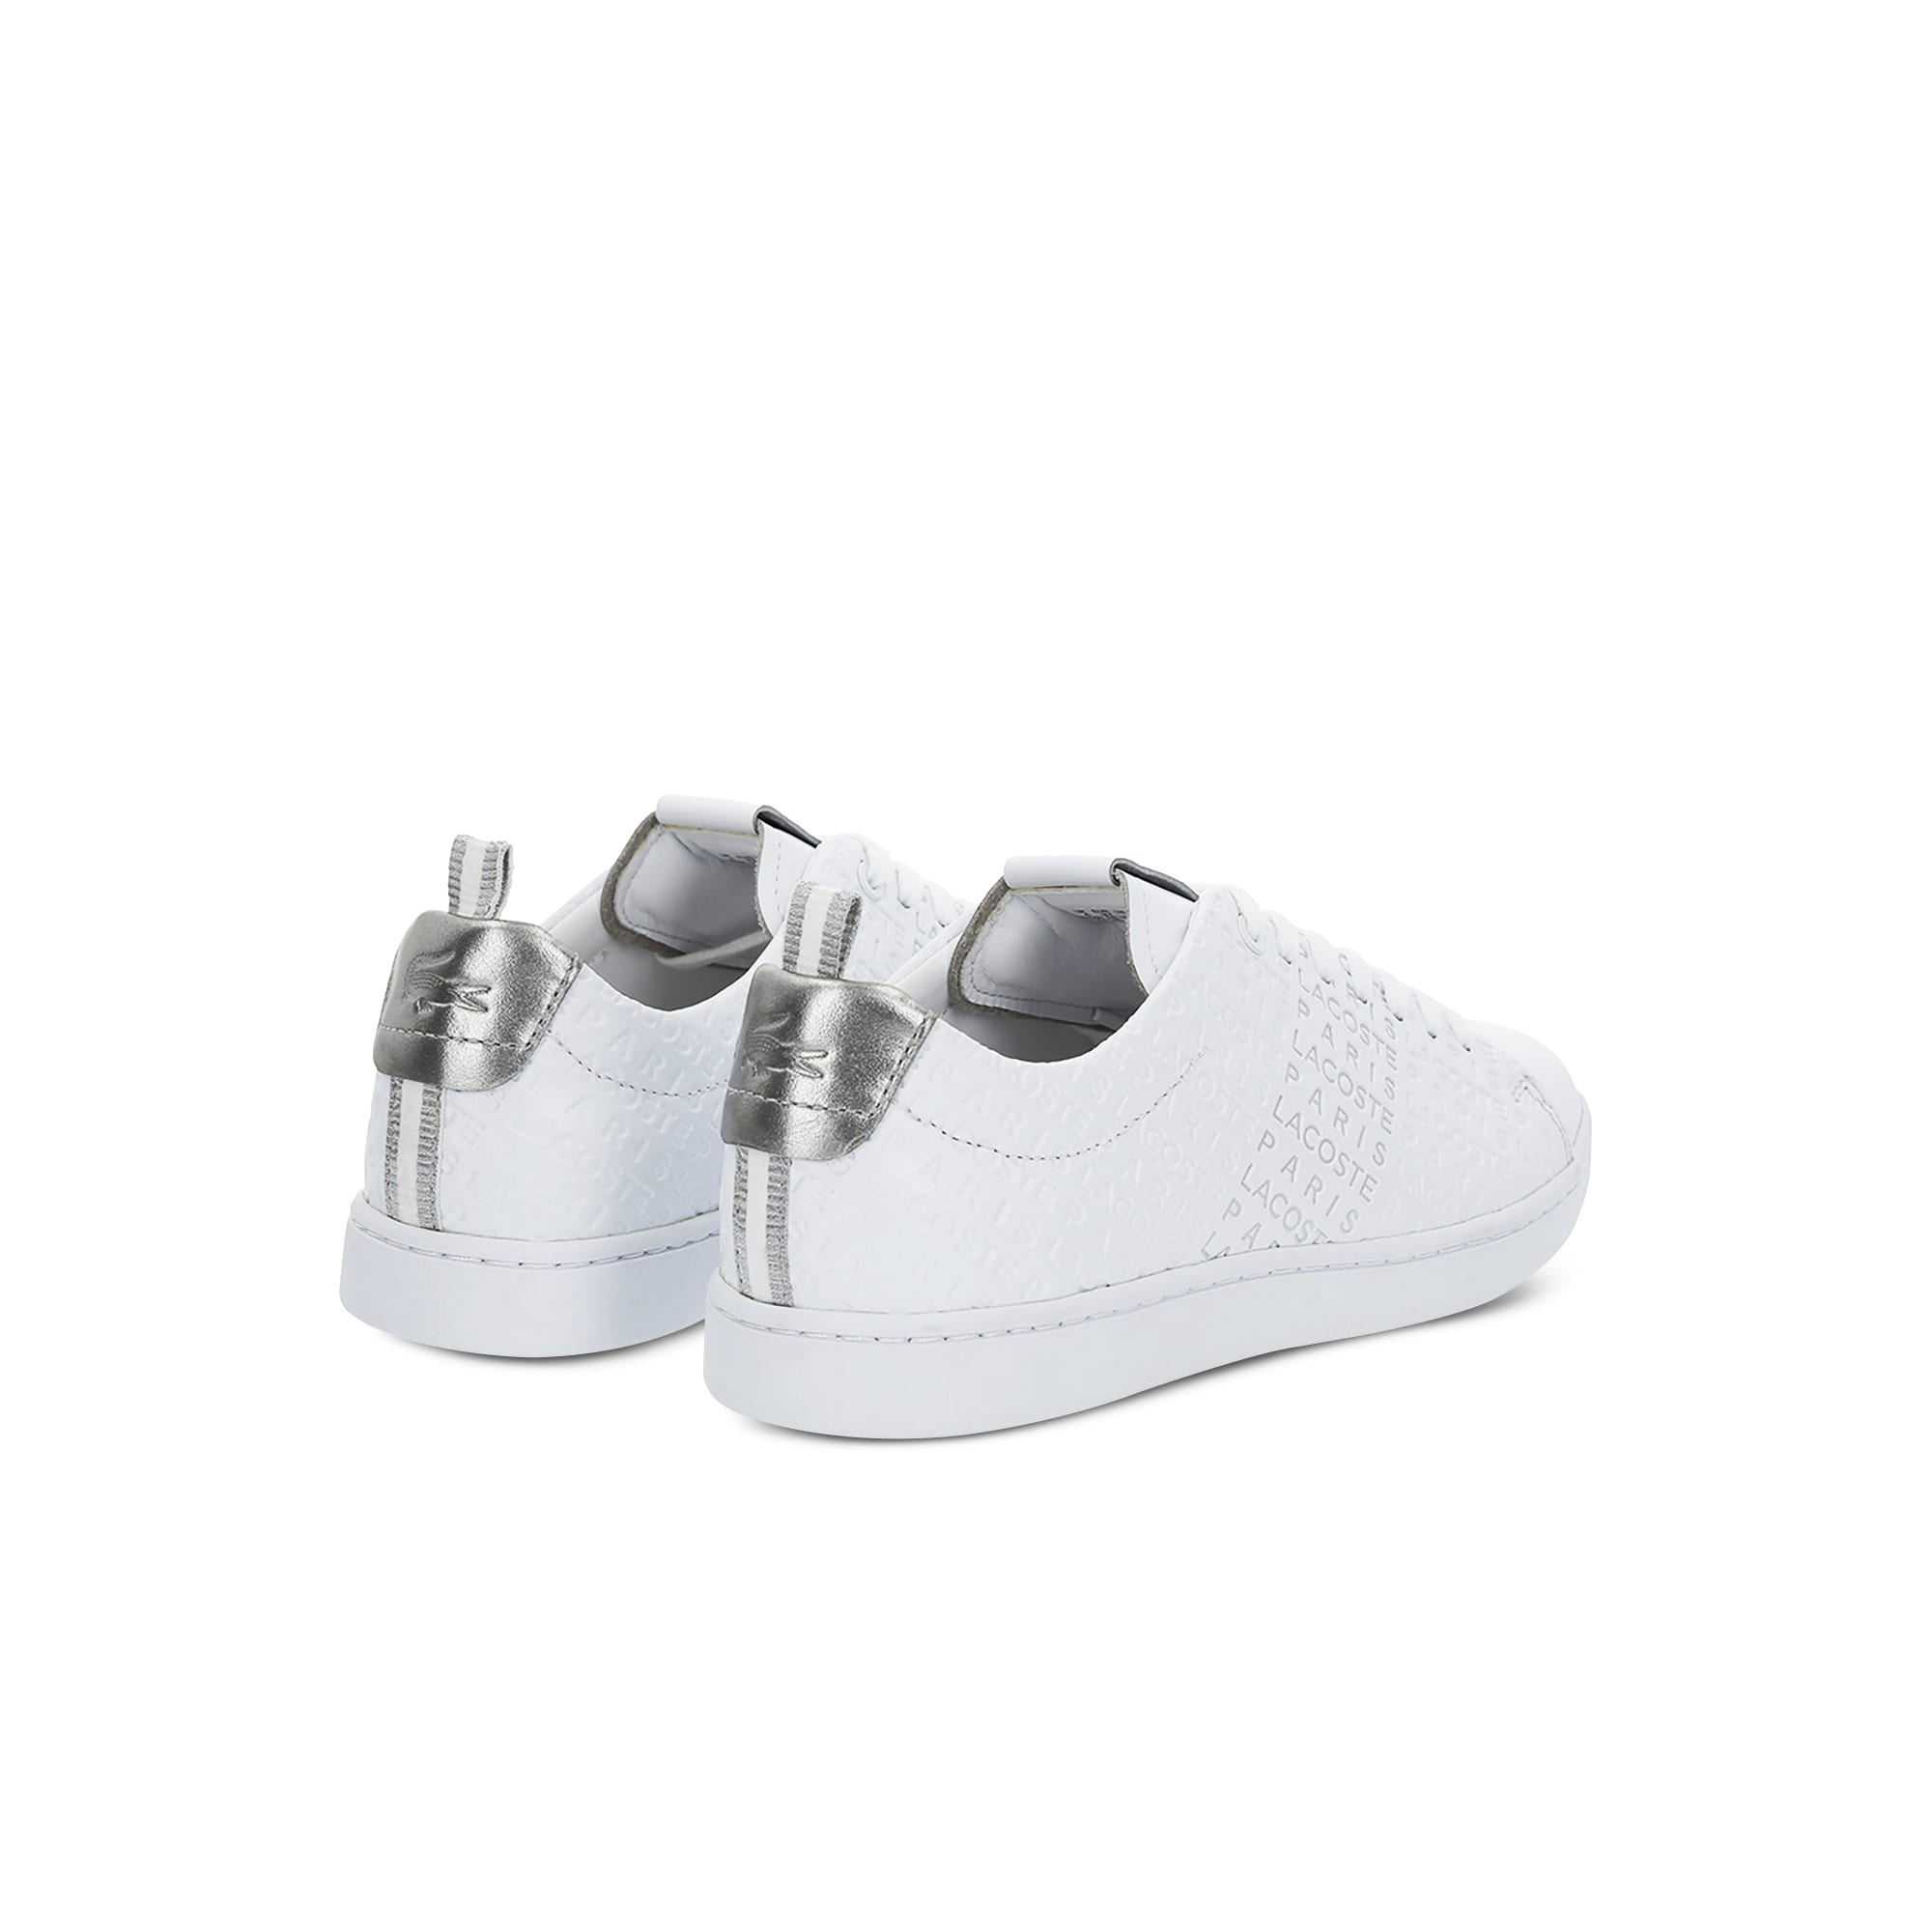 Sneakers Evo Cuir Carnaby Femme Gaufré En qSpUzMGV